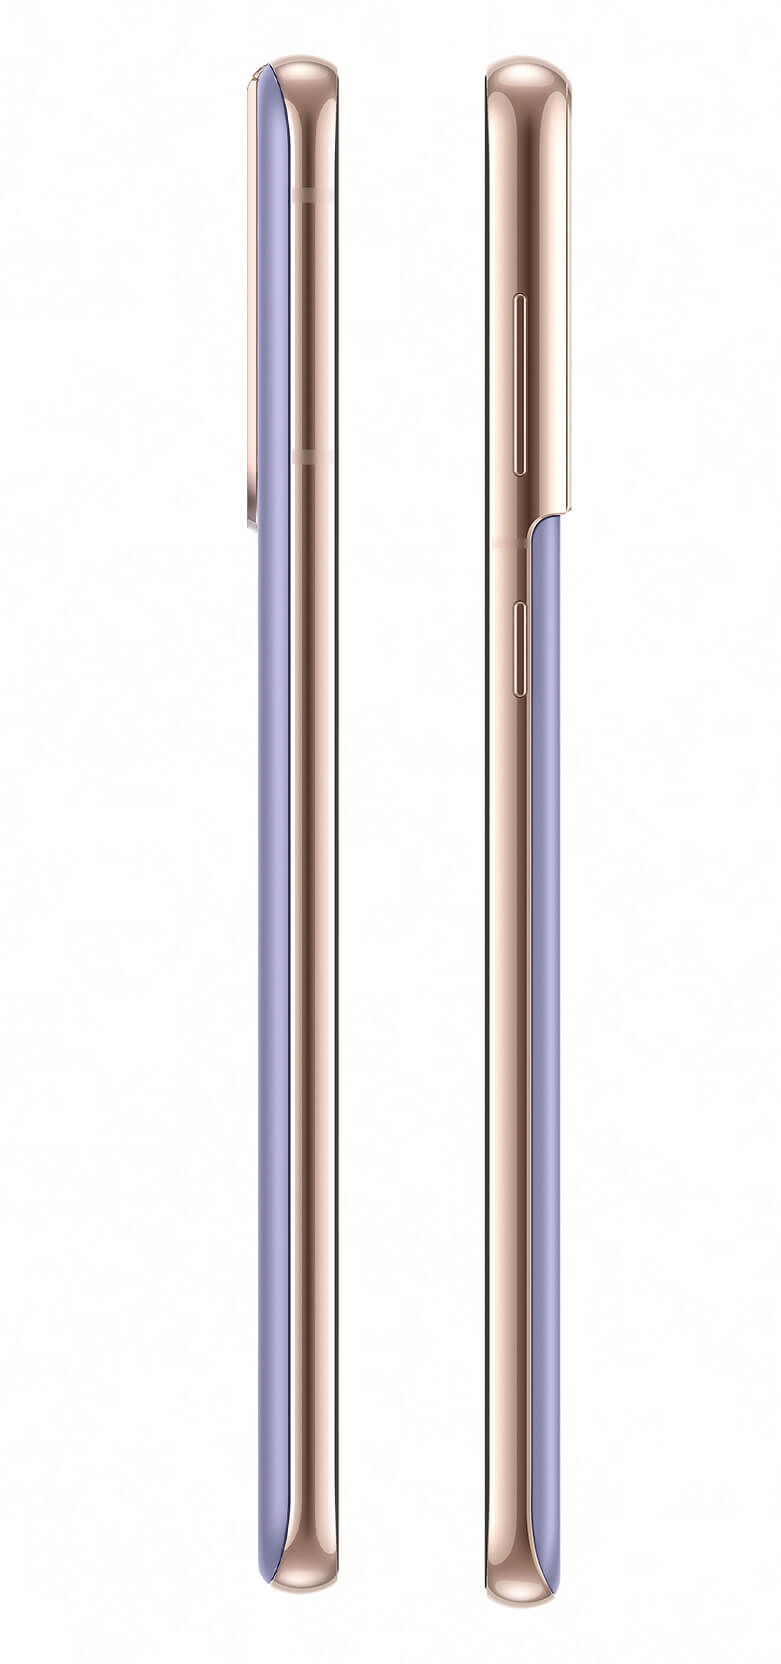 Samsung Galaxy S21 Phantom Violet 8GB RAM |128GB